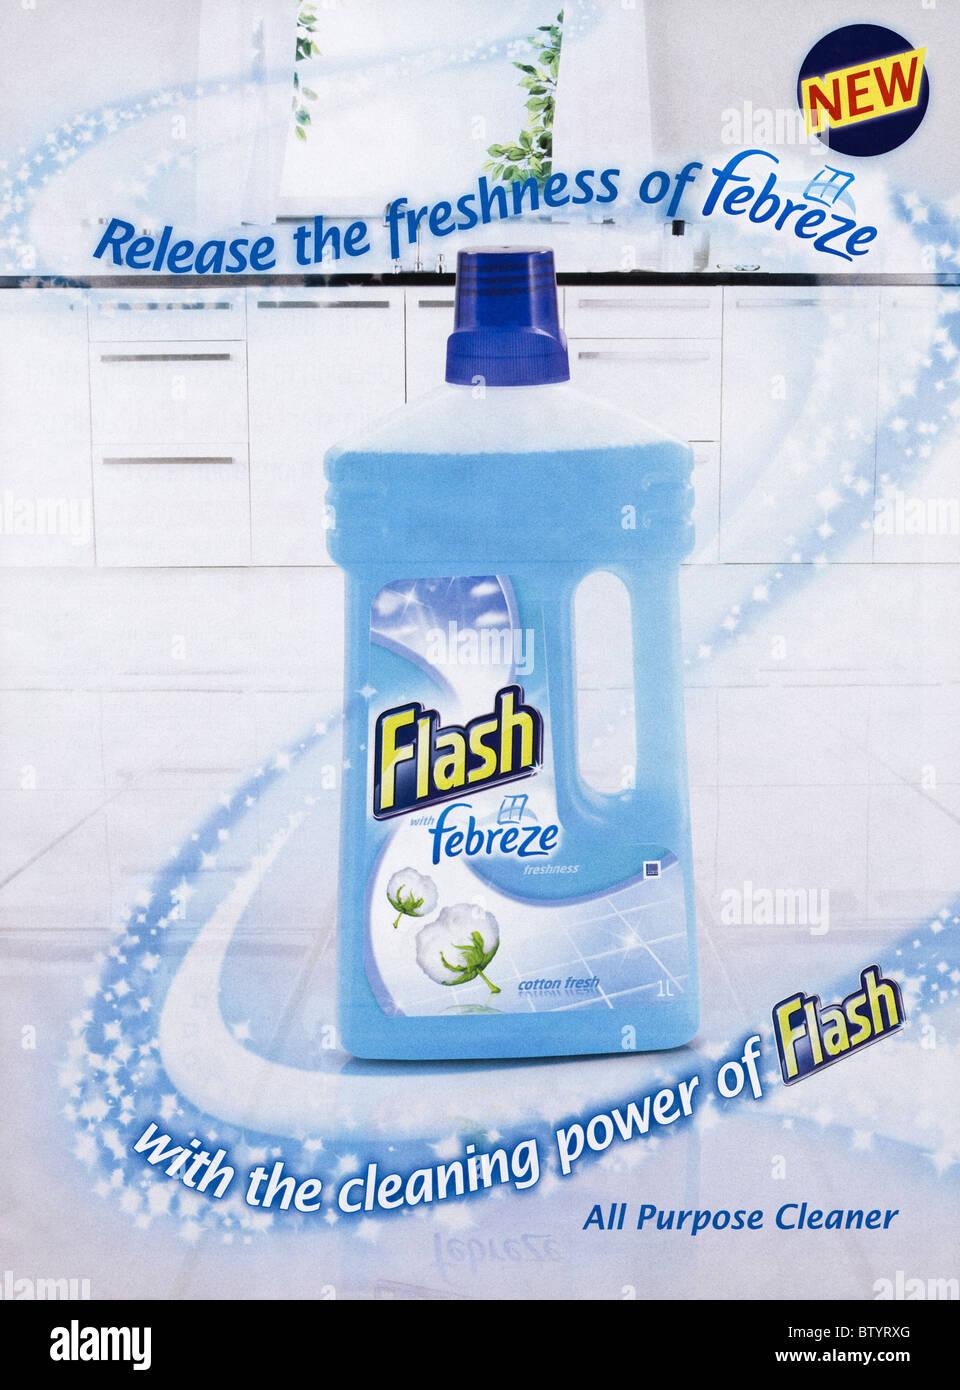 modern advertisement in english magazine dated 2010 for flash modern advertisement in english magazine dated 2010 for flash febreze all purpose cleaner